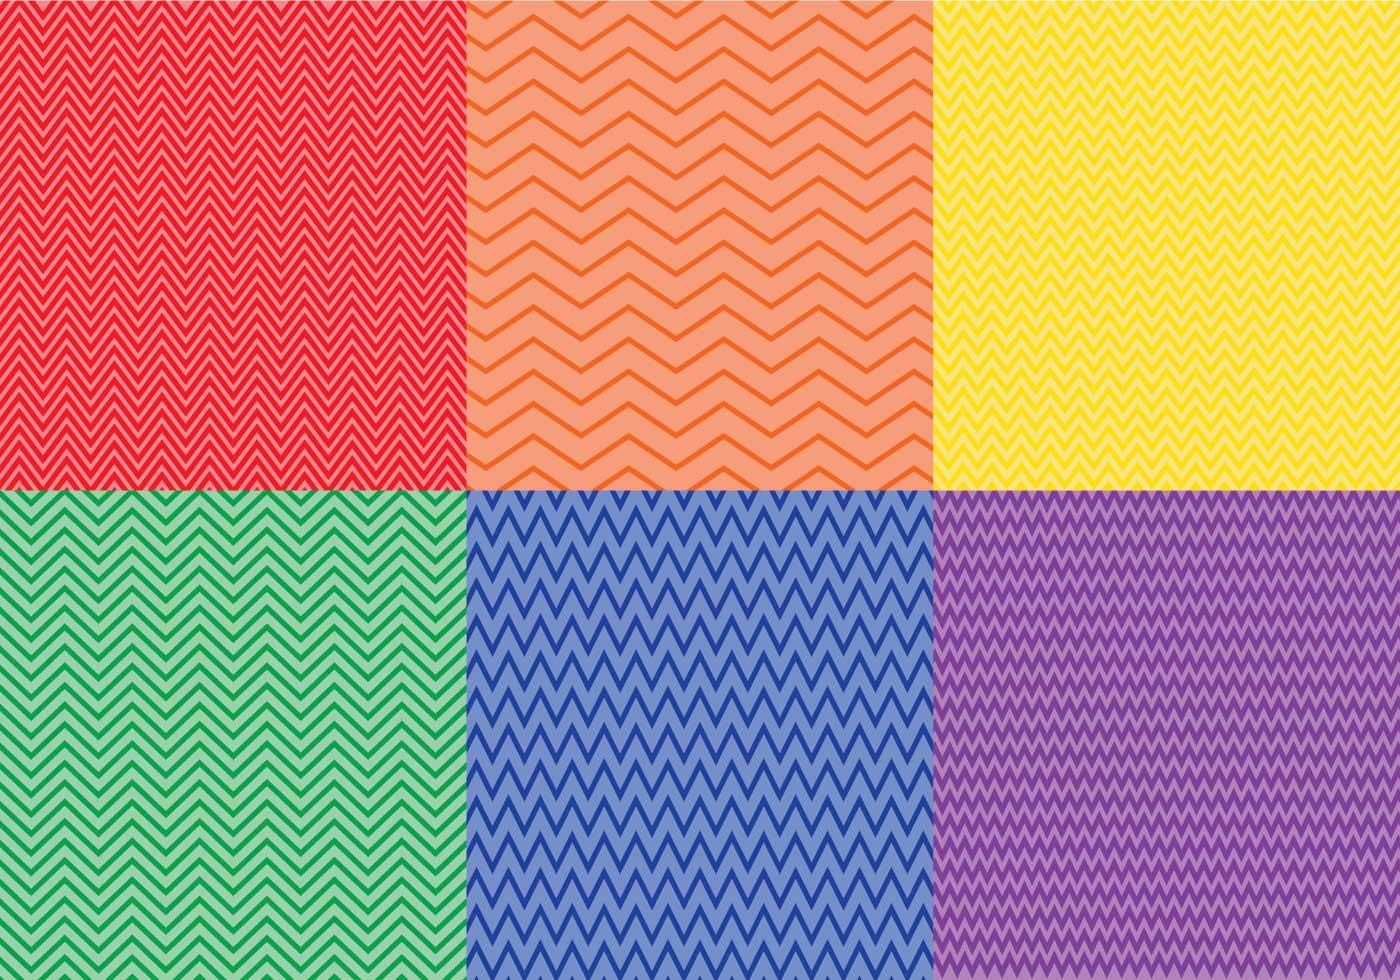 zig zag background vectors colorful zig zag background vector set 1400x980